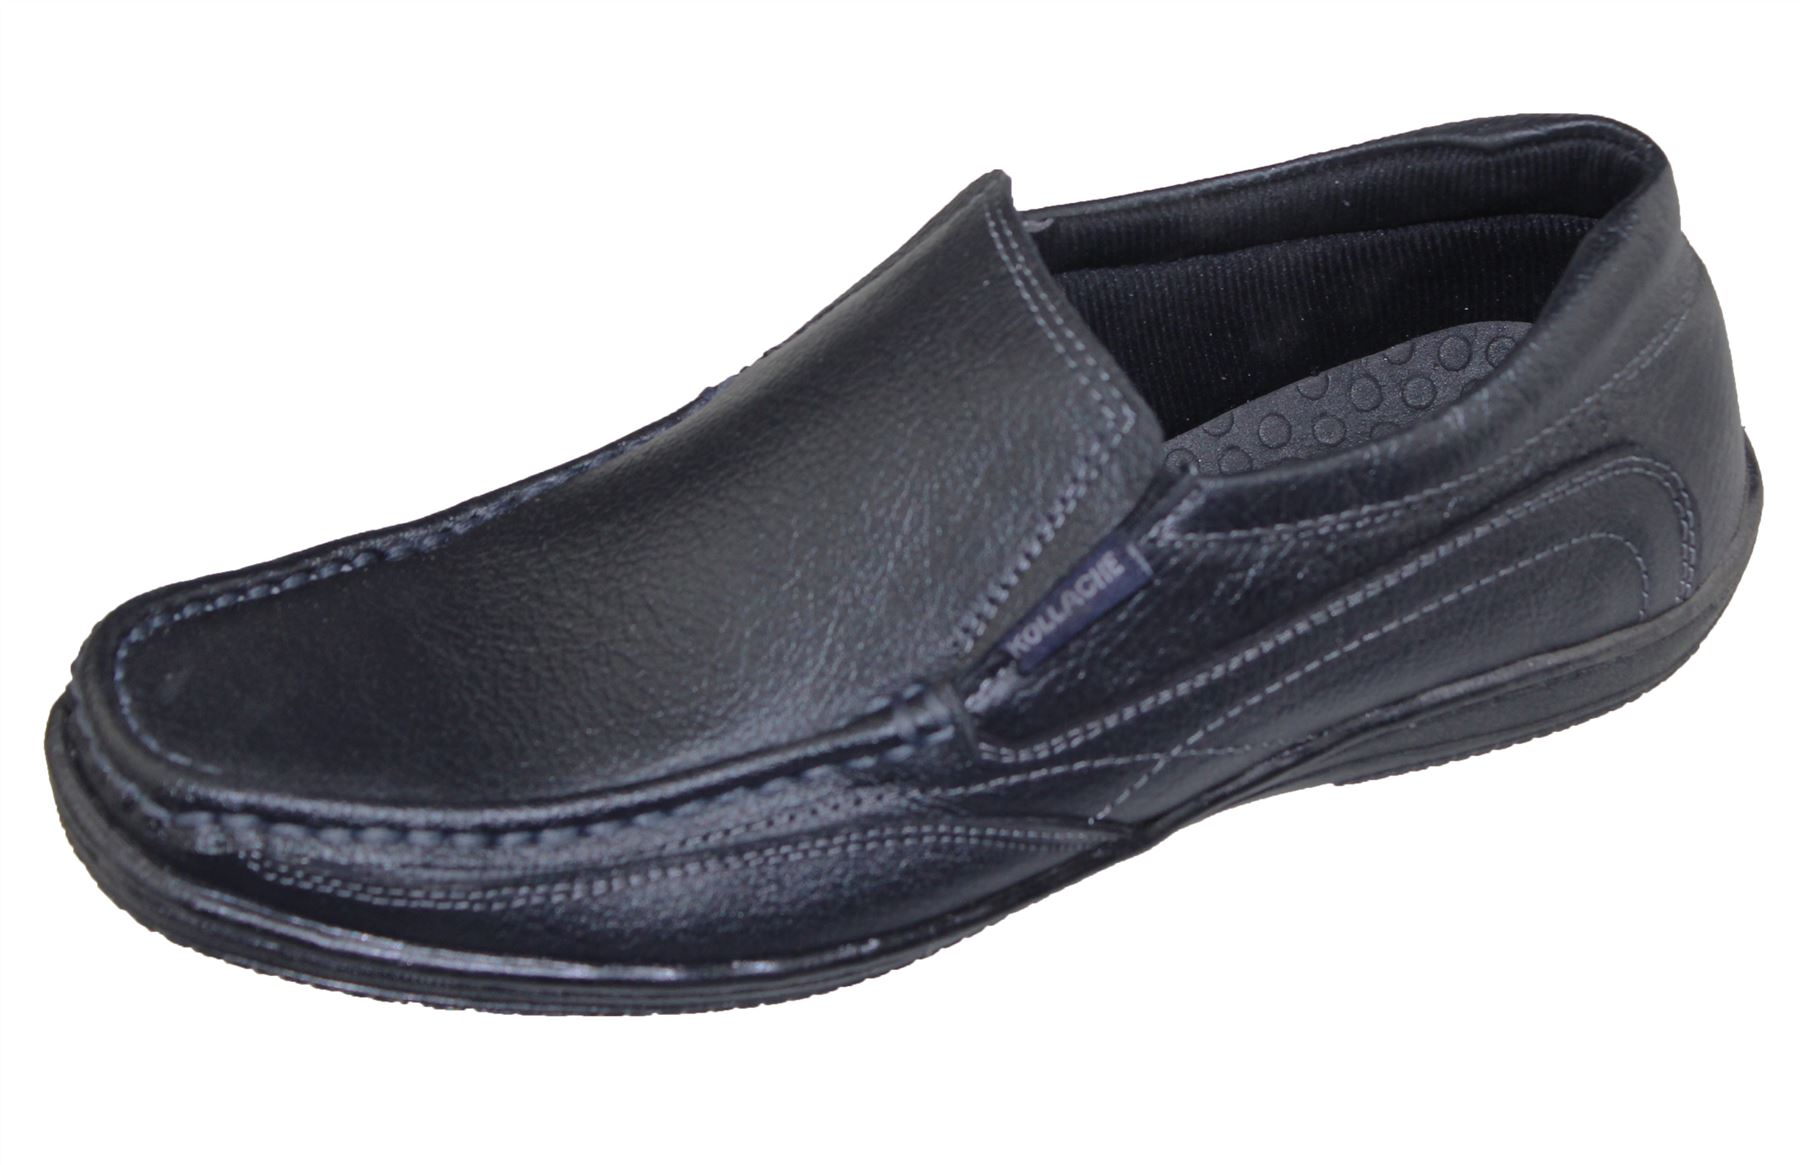 Mens Slipon Walking Shoes